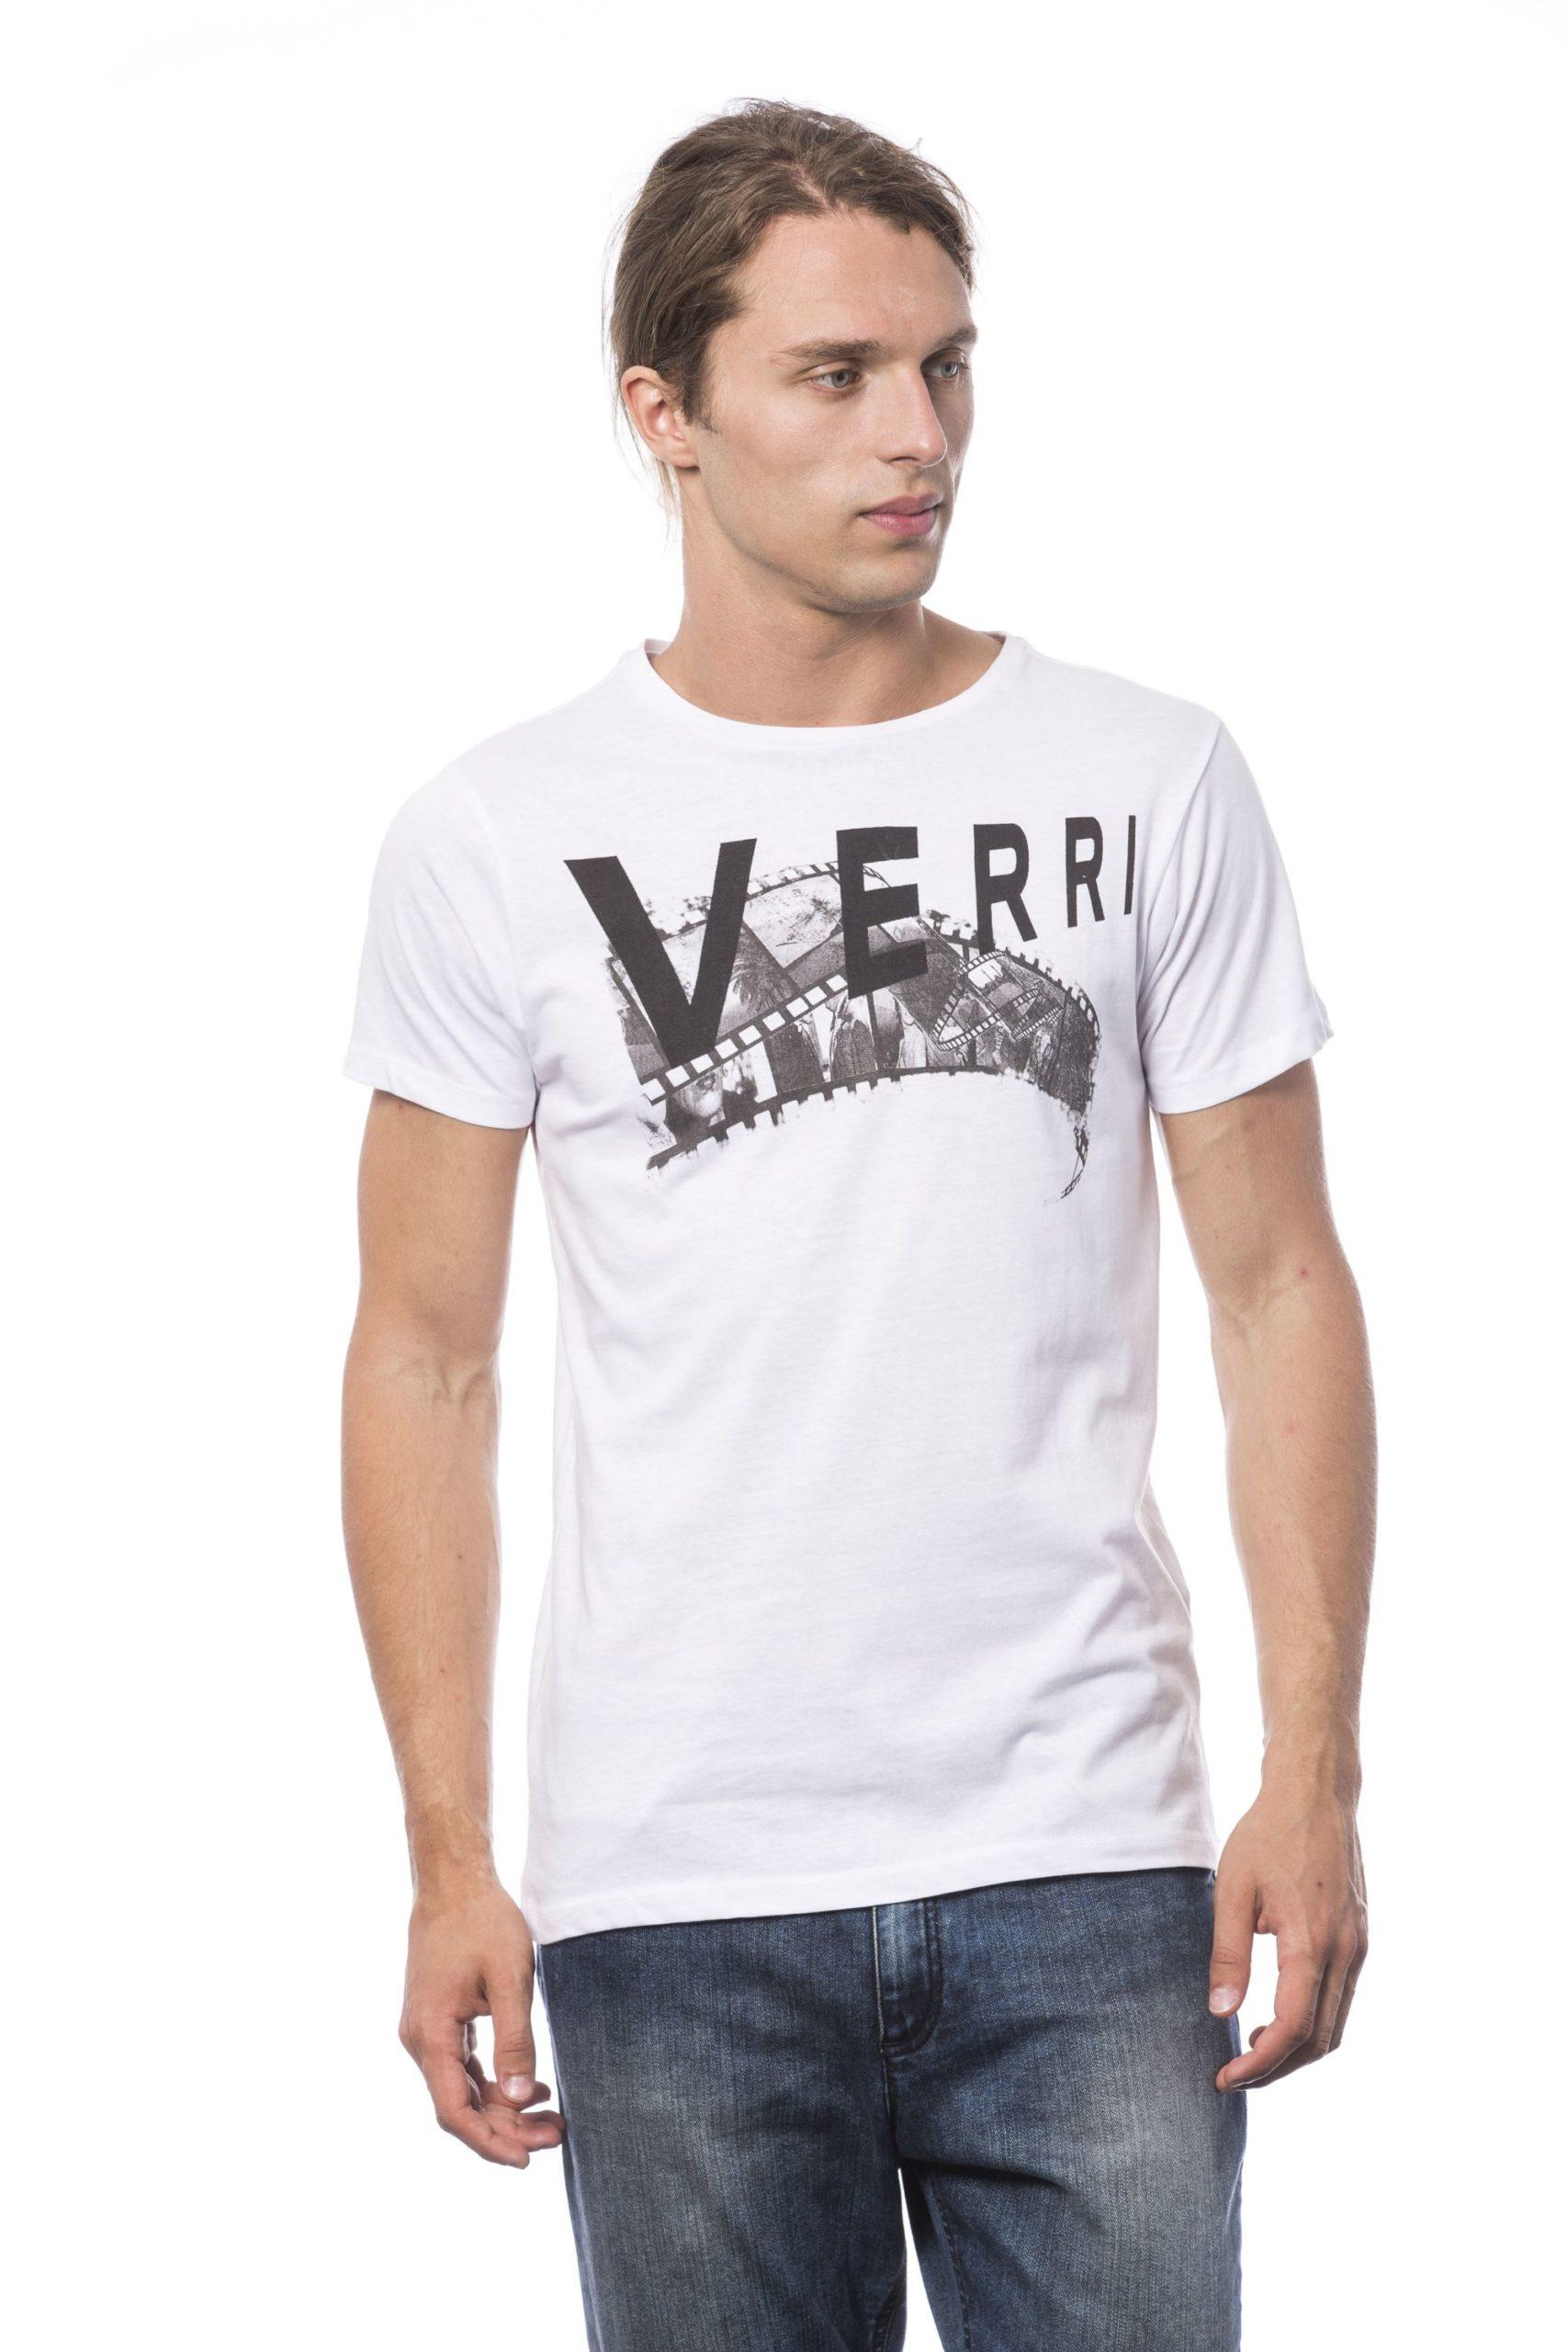 Verri Men's Bianco T-Shirt White VE681327 - S